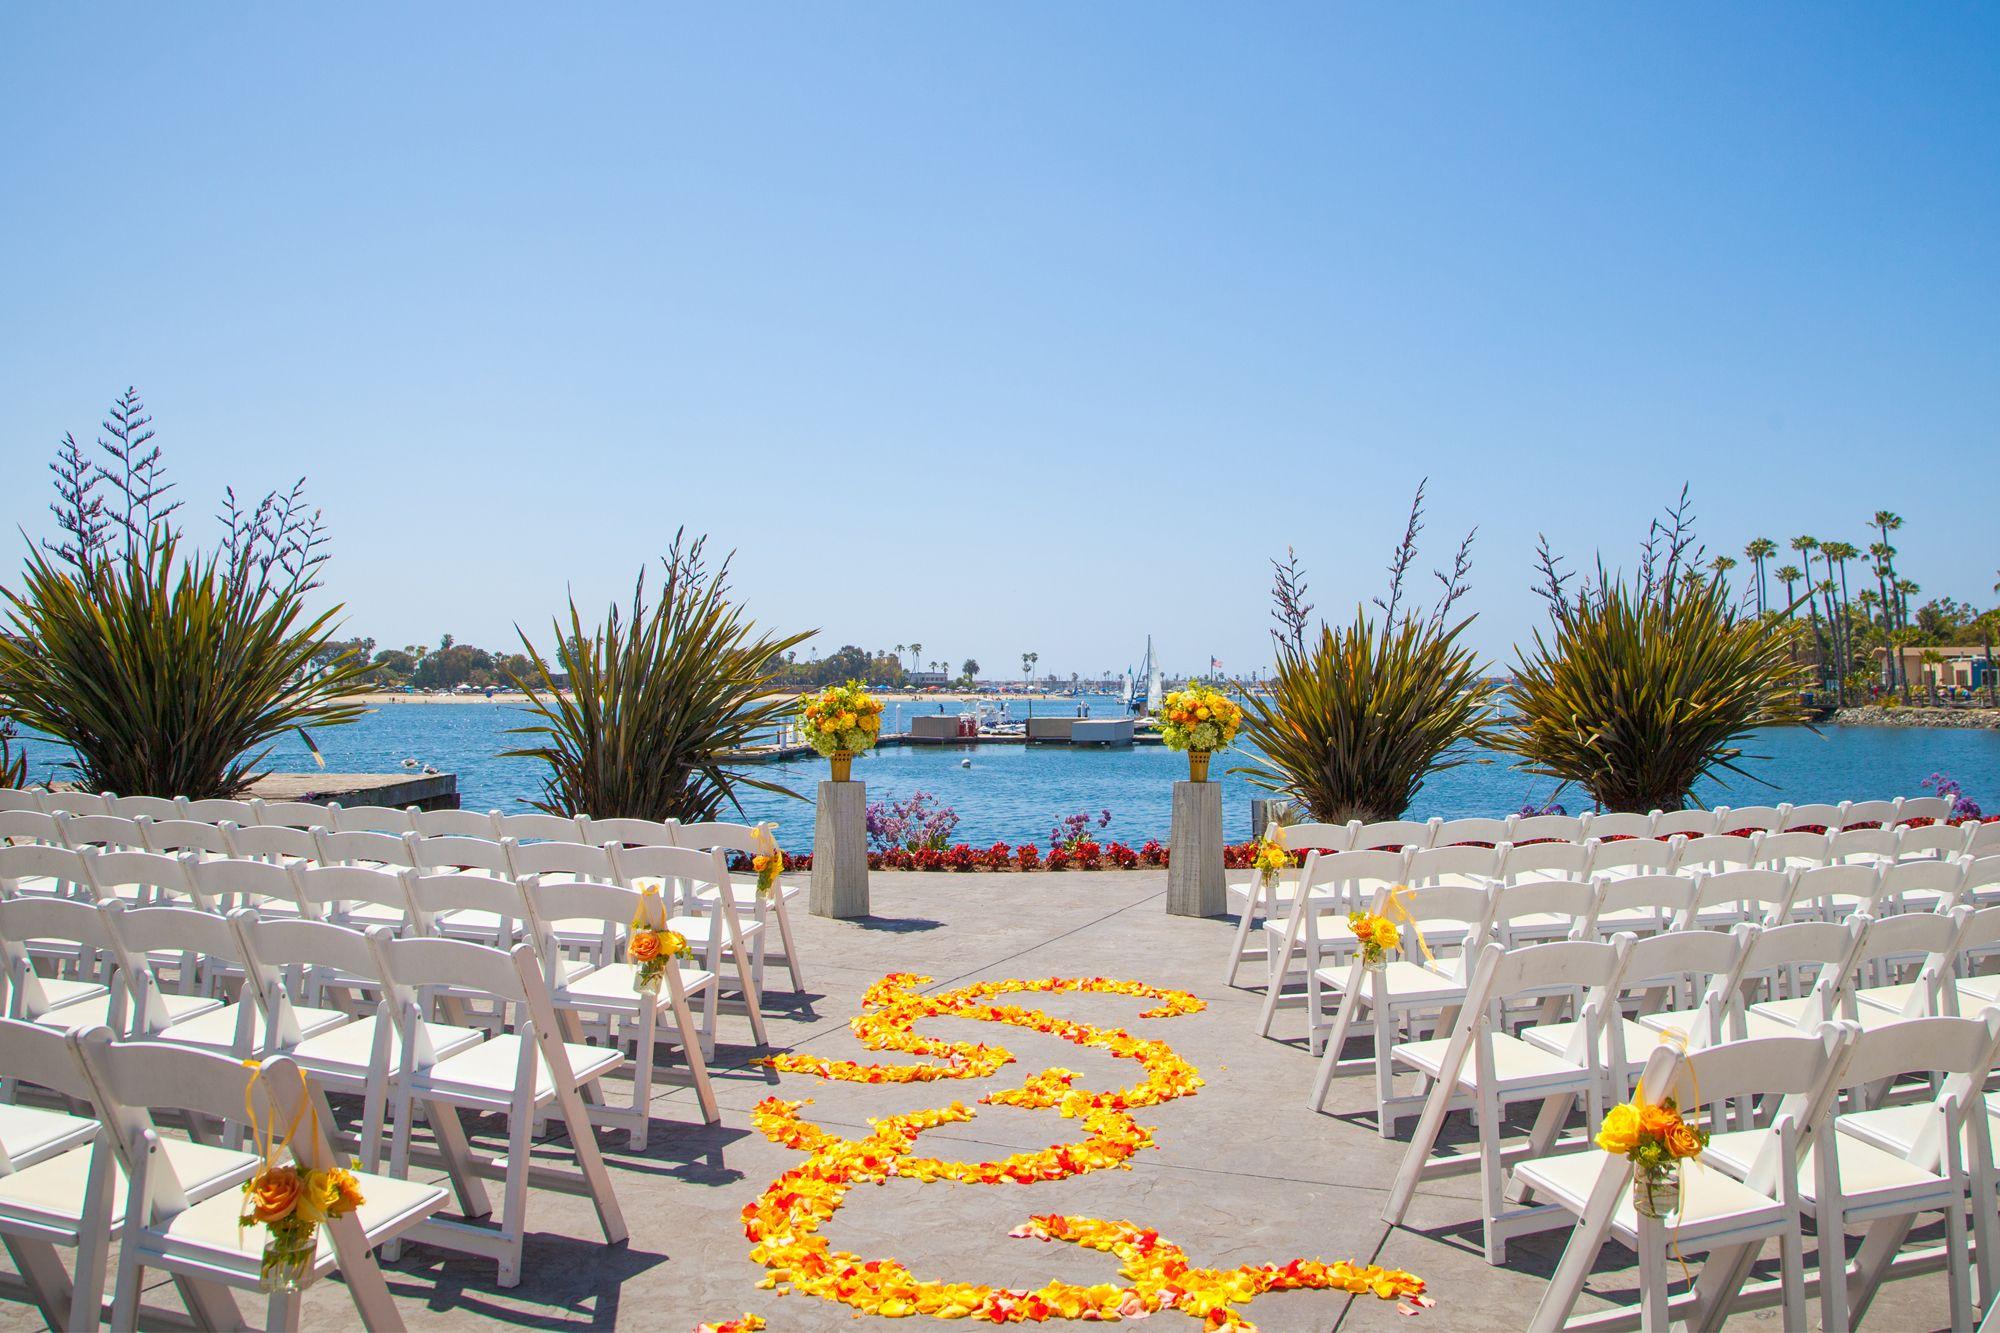 Pin By Rajee Pandi On Island I Do S Contest Wedding Venues Beach Southern California Wedding Venues San Diego Beach Wedding Venues